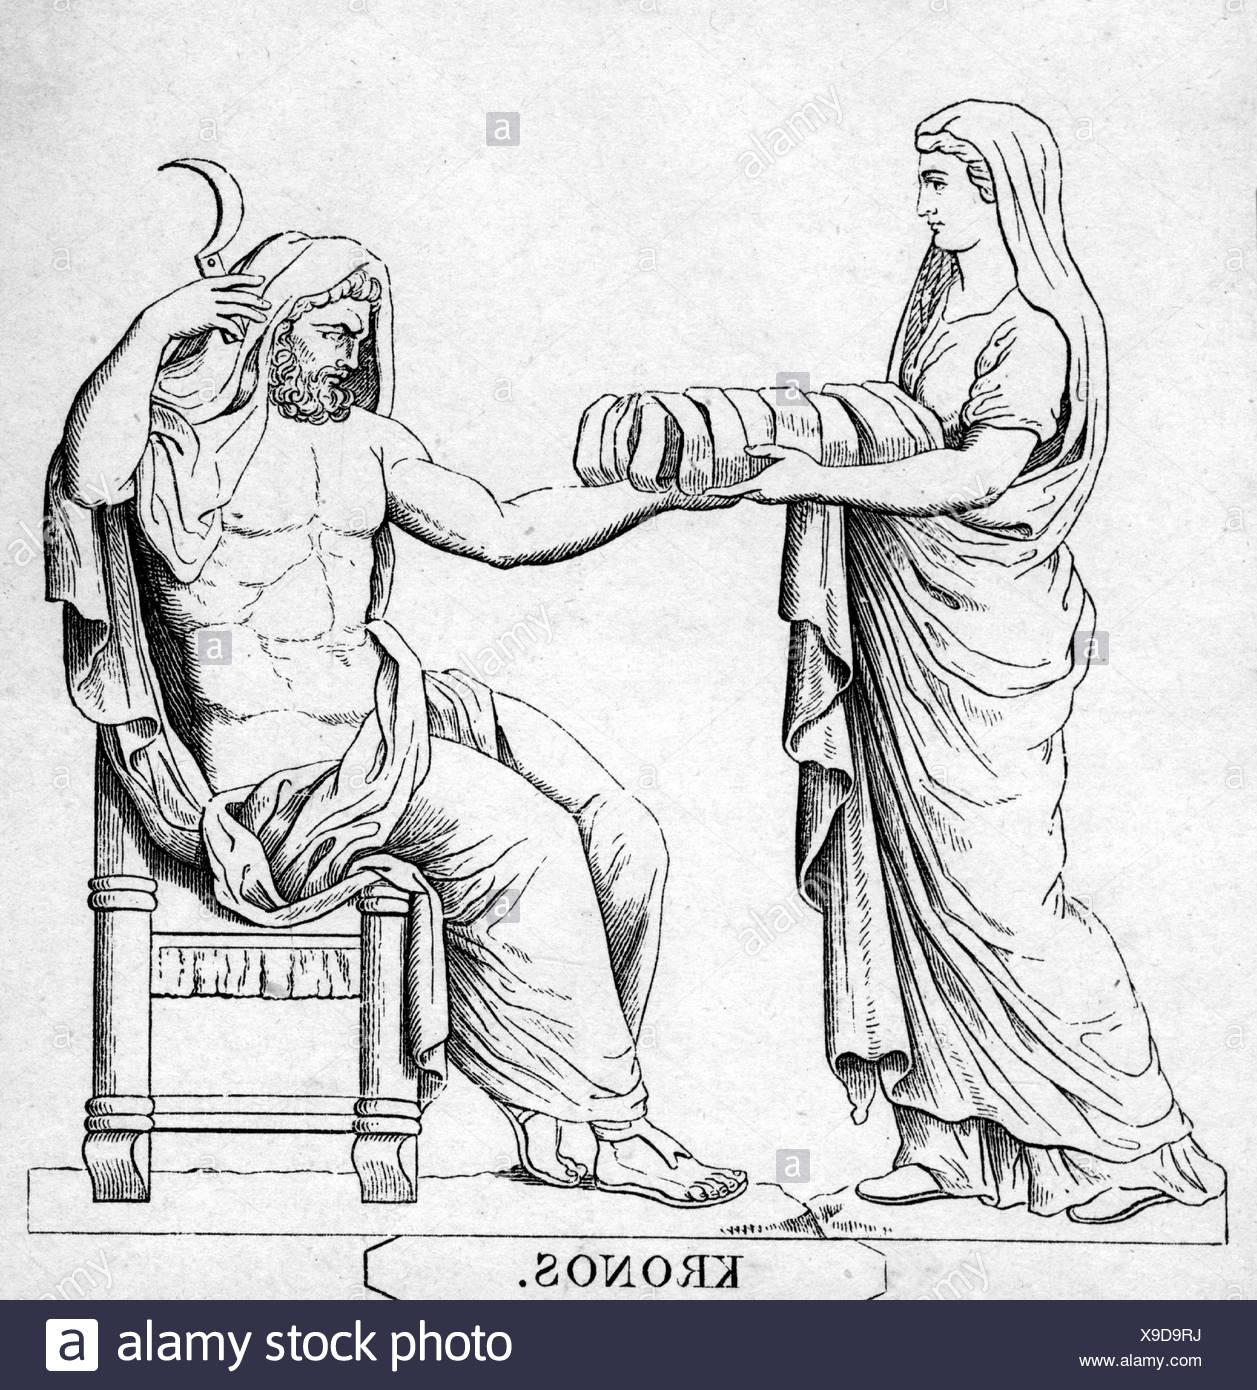 Cronus stock photos cronus stock images alamy cronus greek god half length his sister and wife rhea handing him a buycottarizona Images